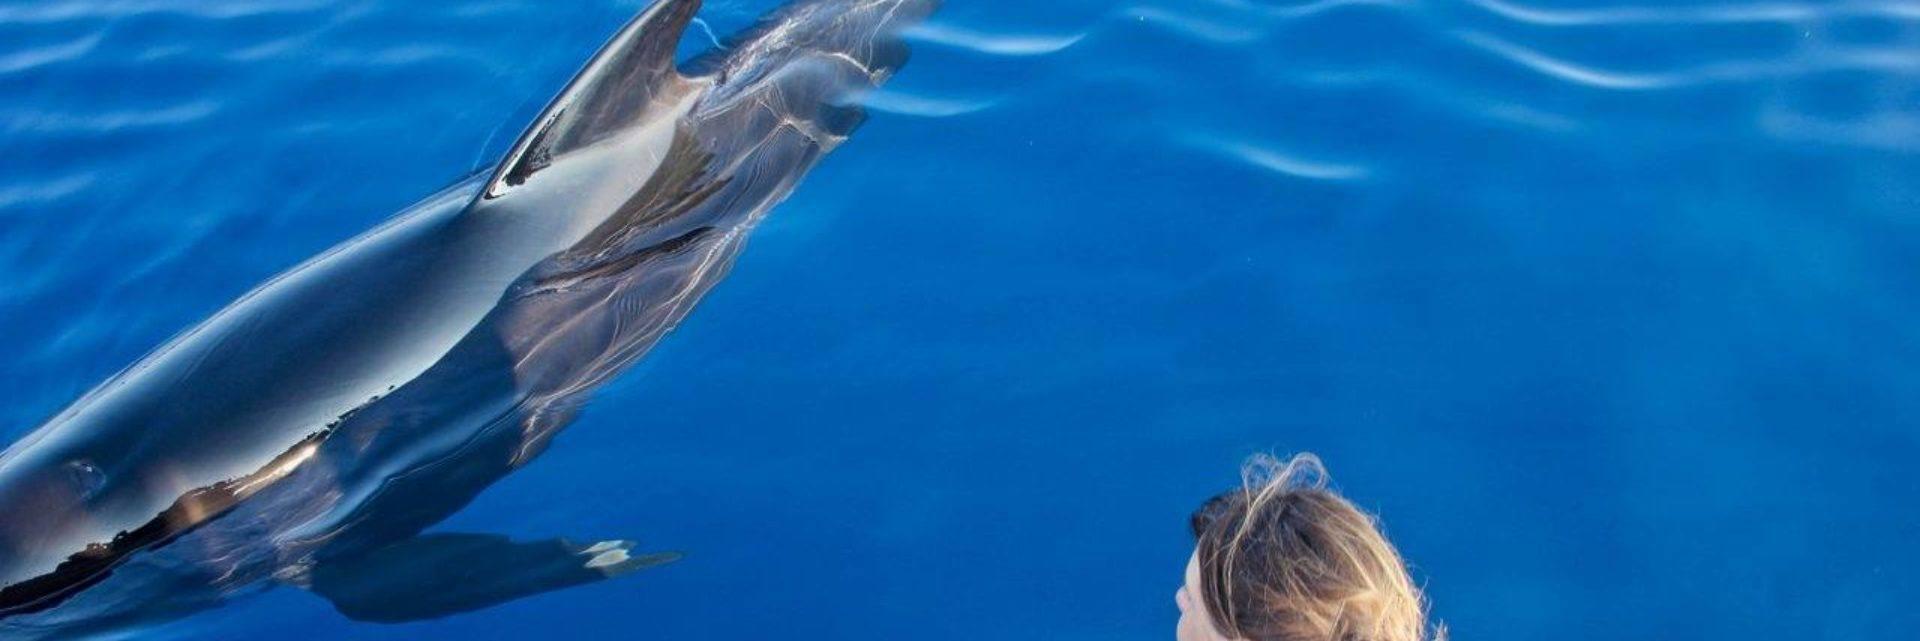 Vertical Horizon - Observation des baleines et dauphins